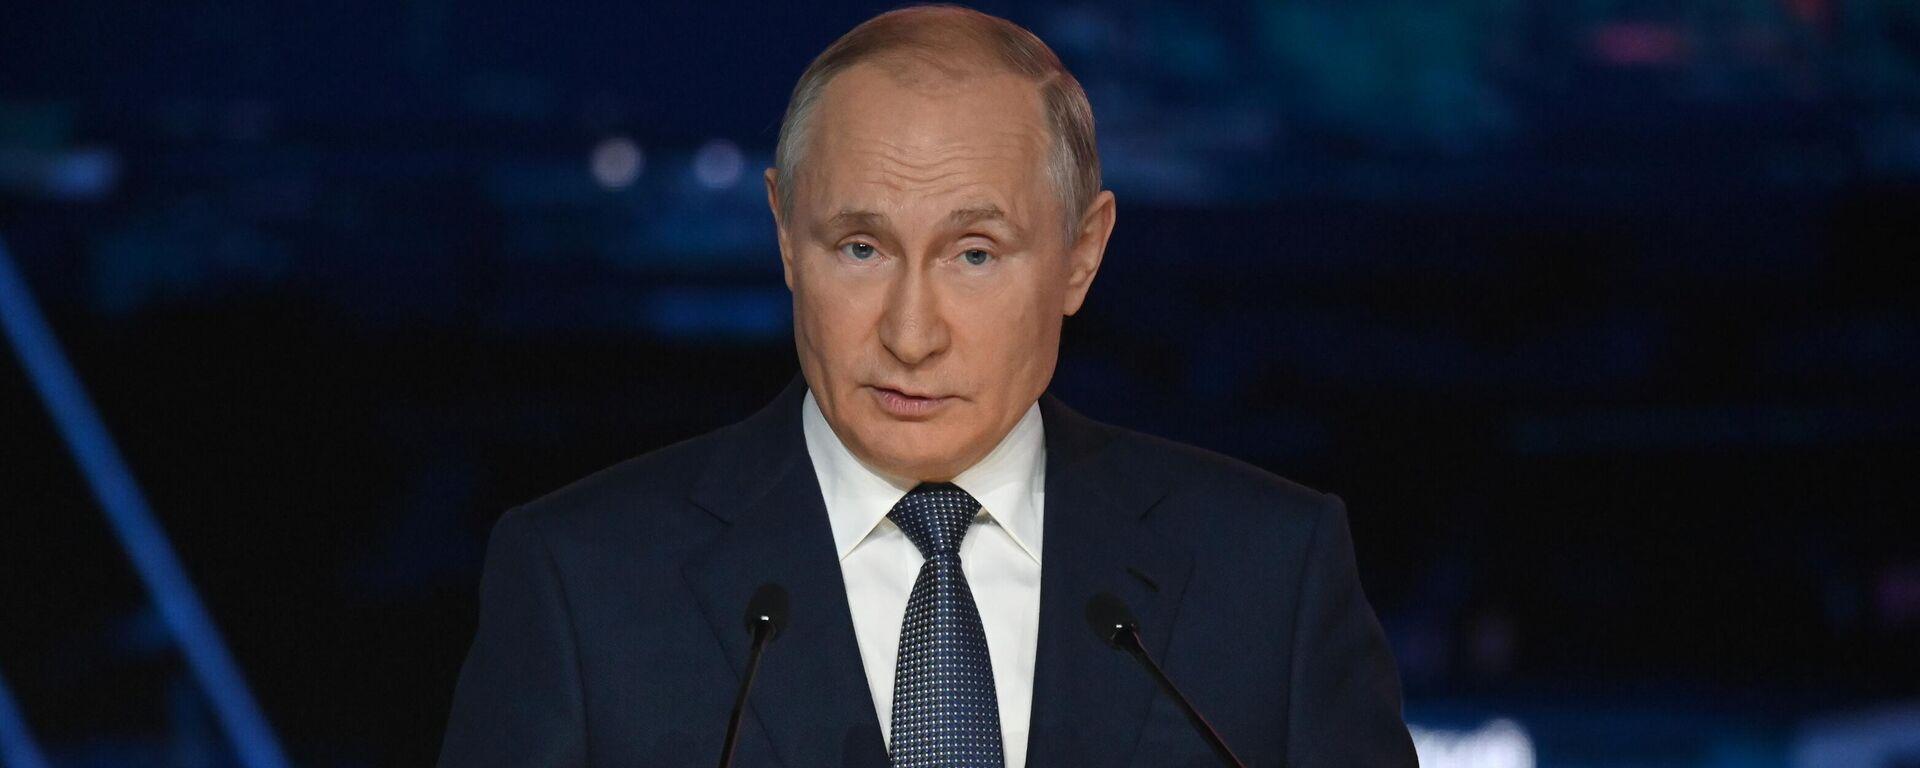 Vladímir Putin, presidente de Rusia - Sputnik Mundo, 1920, 13.10.2021